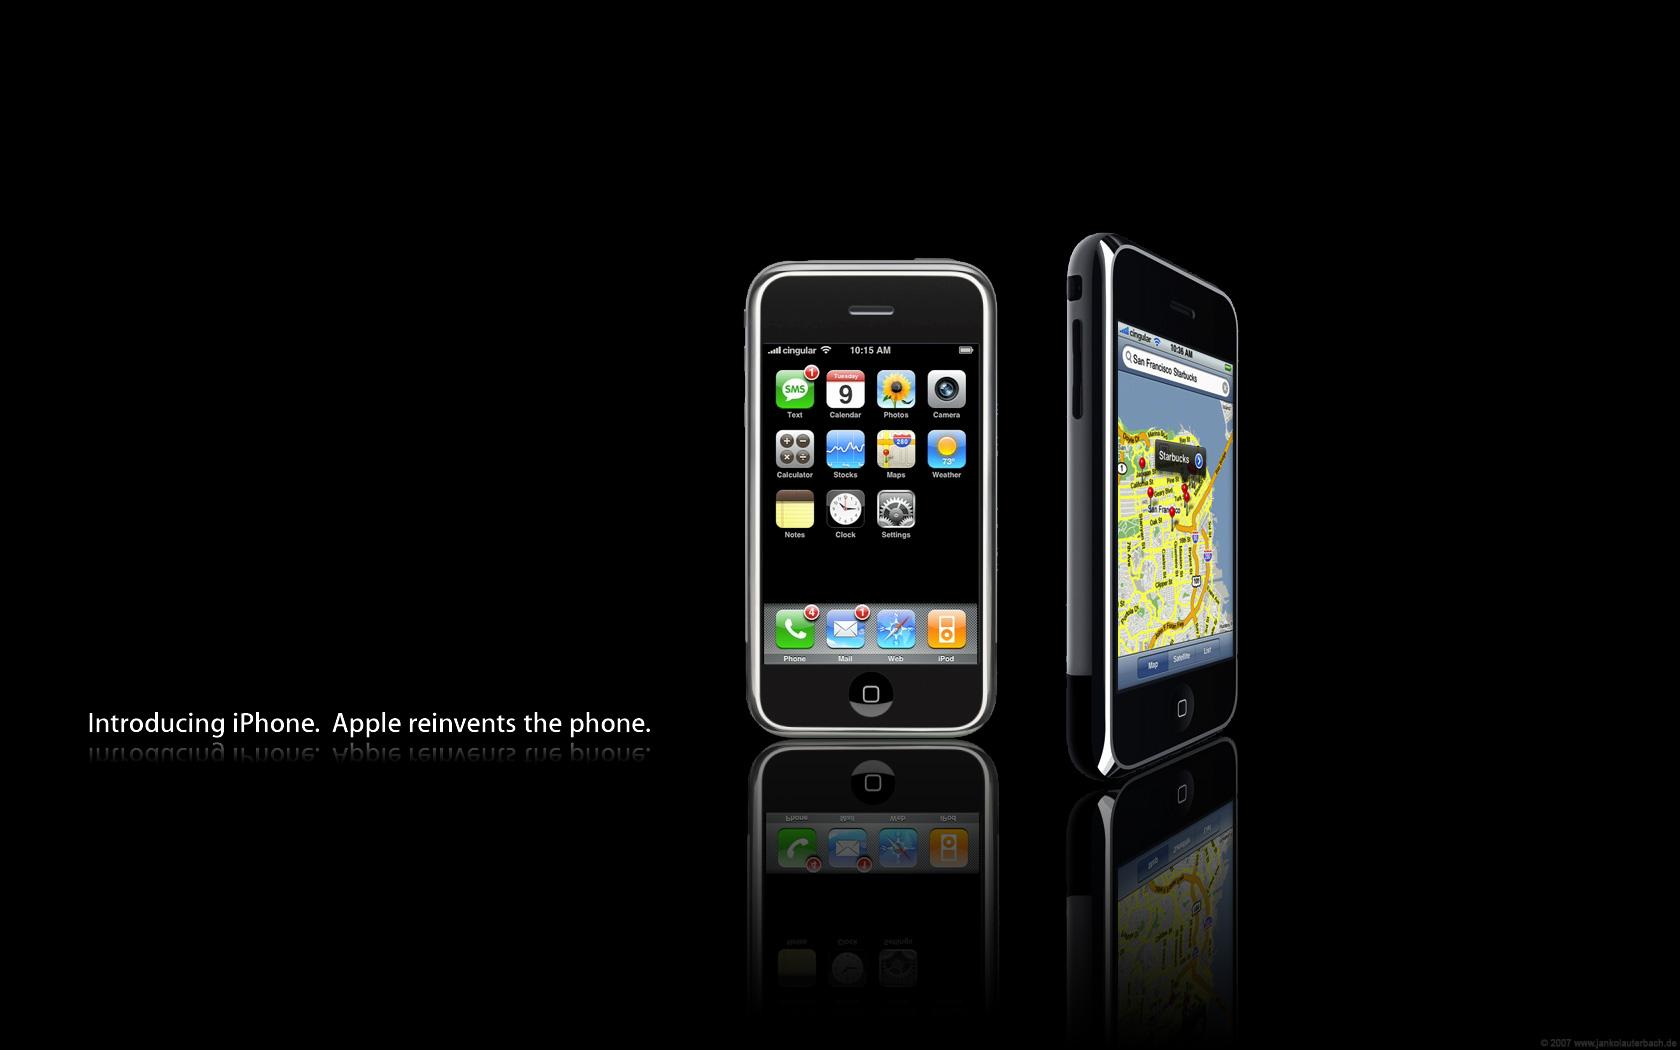 iphone reinvents the phone hd wallpaper 4080jpg 1680x1050